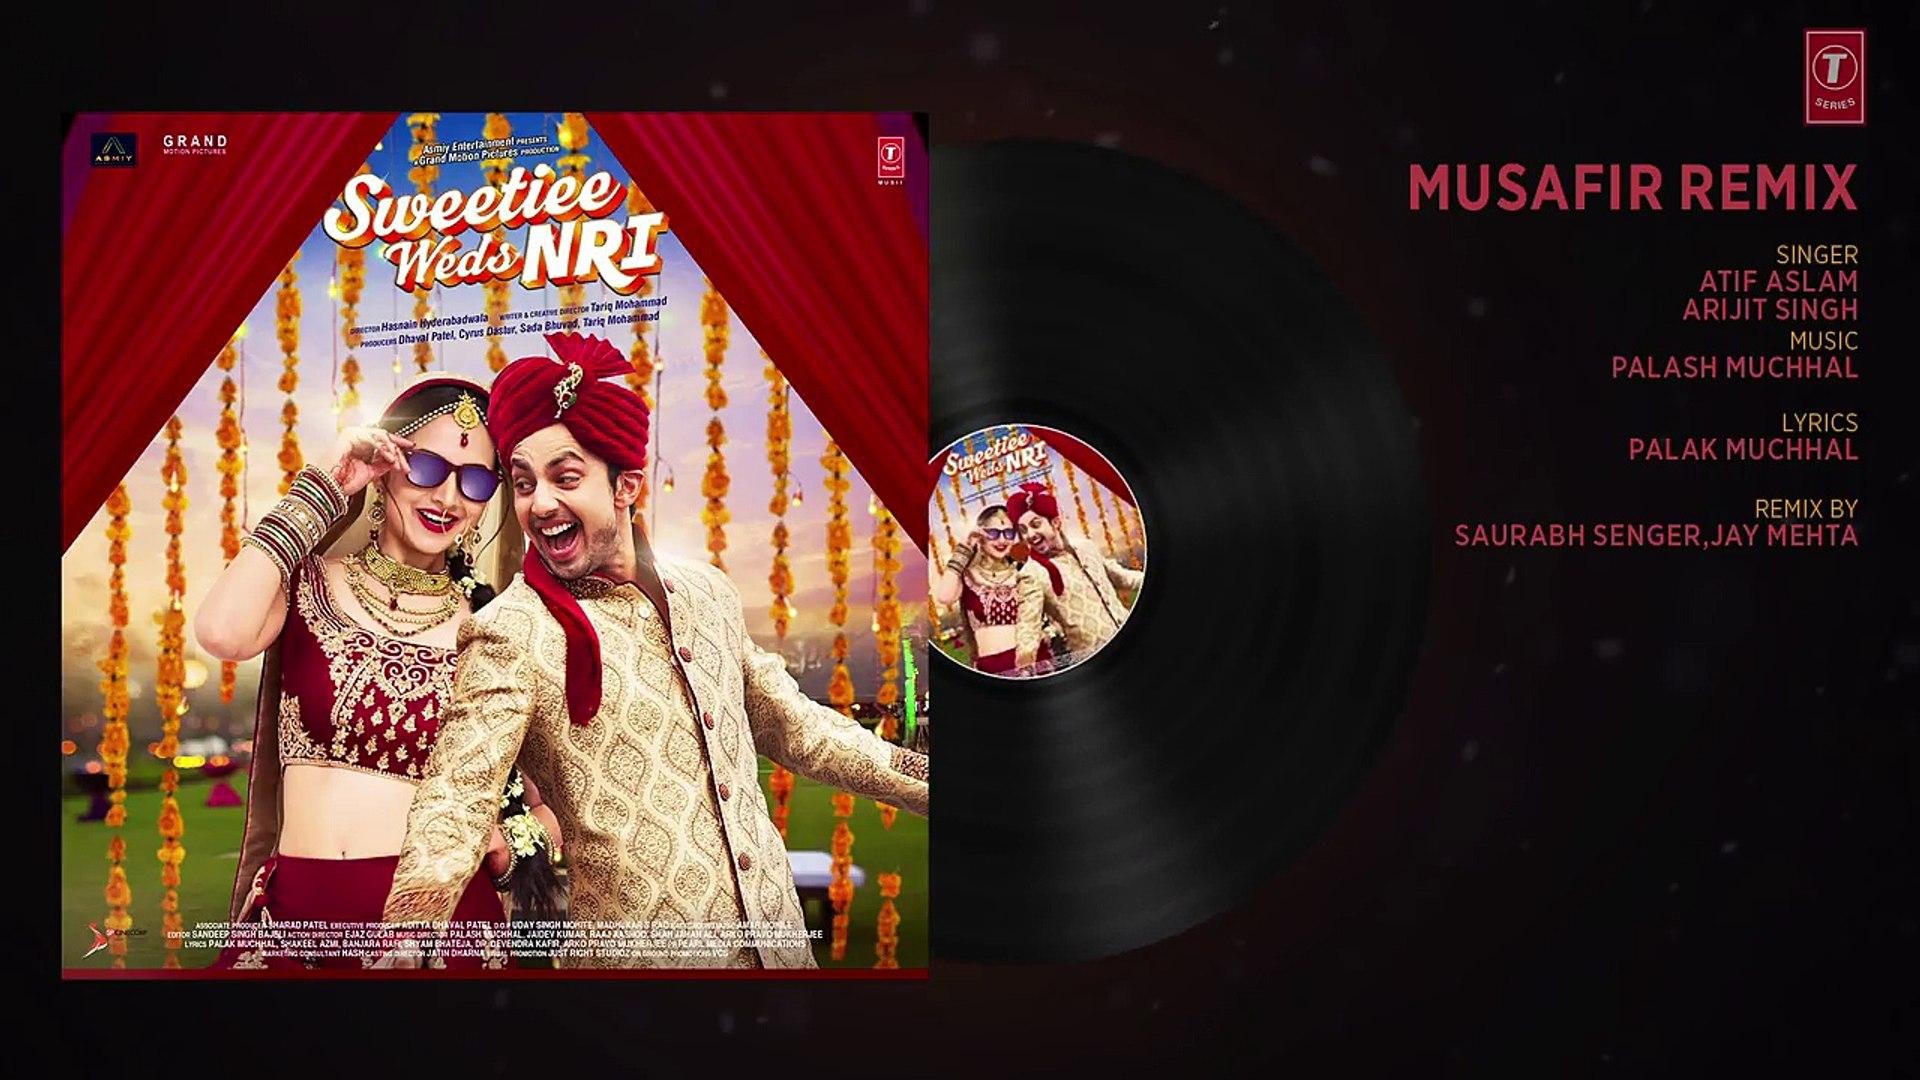 Musafir Remix Song (Full Audio) | Atif Aslam & Arijit Singh | Sweetiee Weds NRI